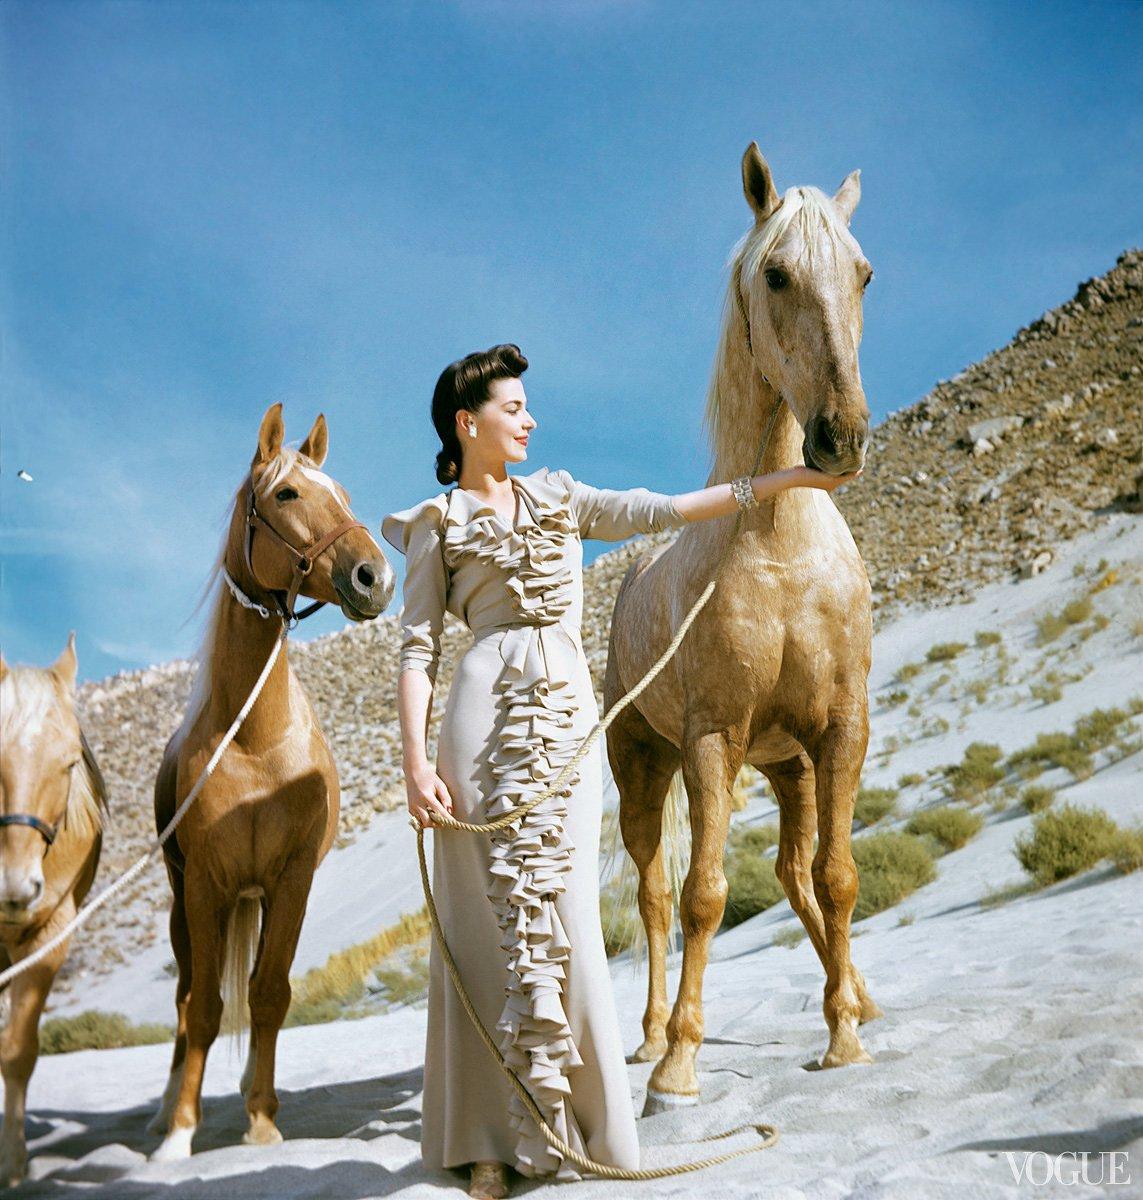 horses-in-vogue-04_153358802376